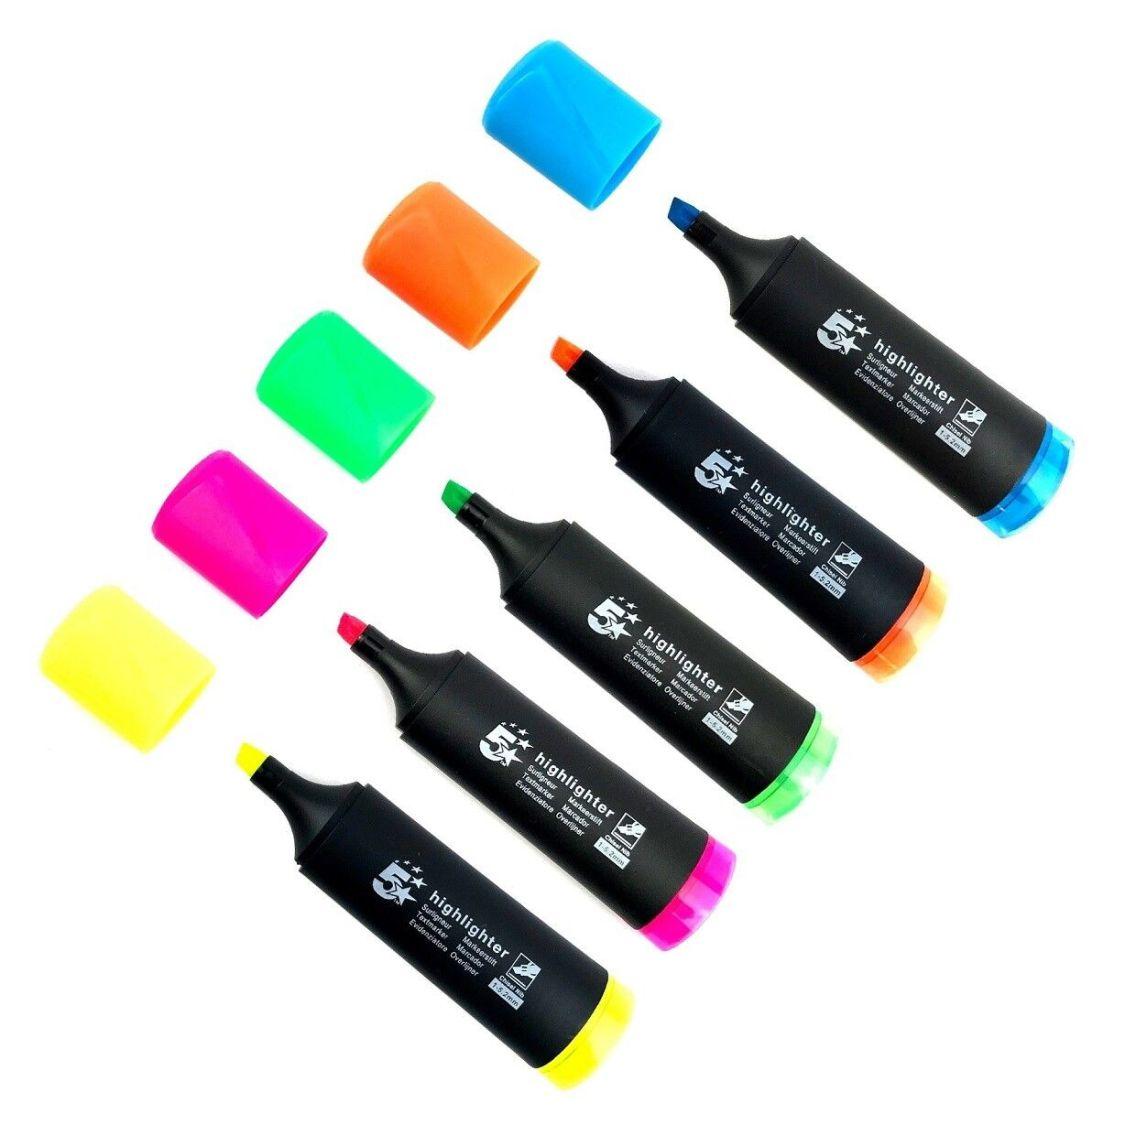 5 x Textmarker Set, farbig sortiert mit Keilspitze 1-5 mm Strichstärke